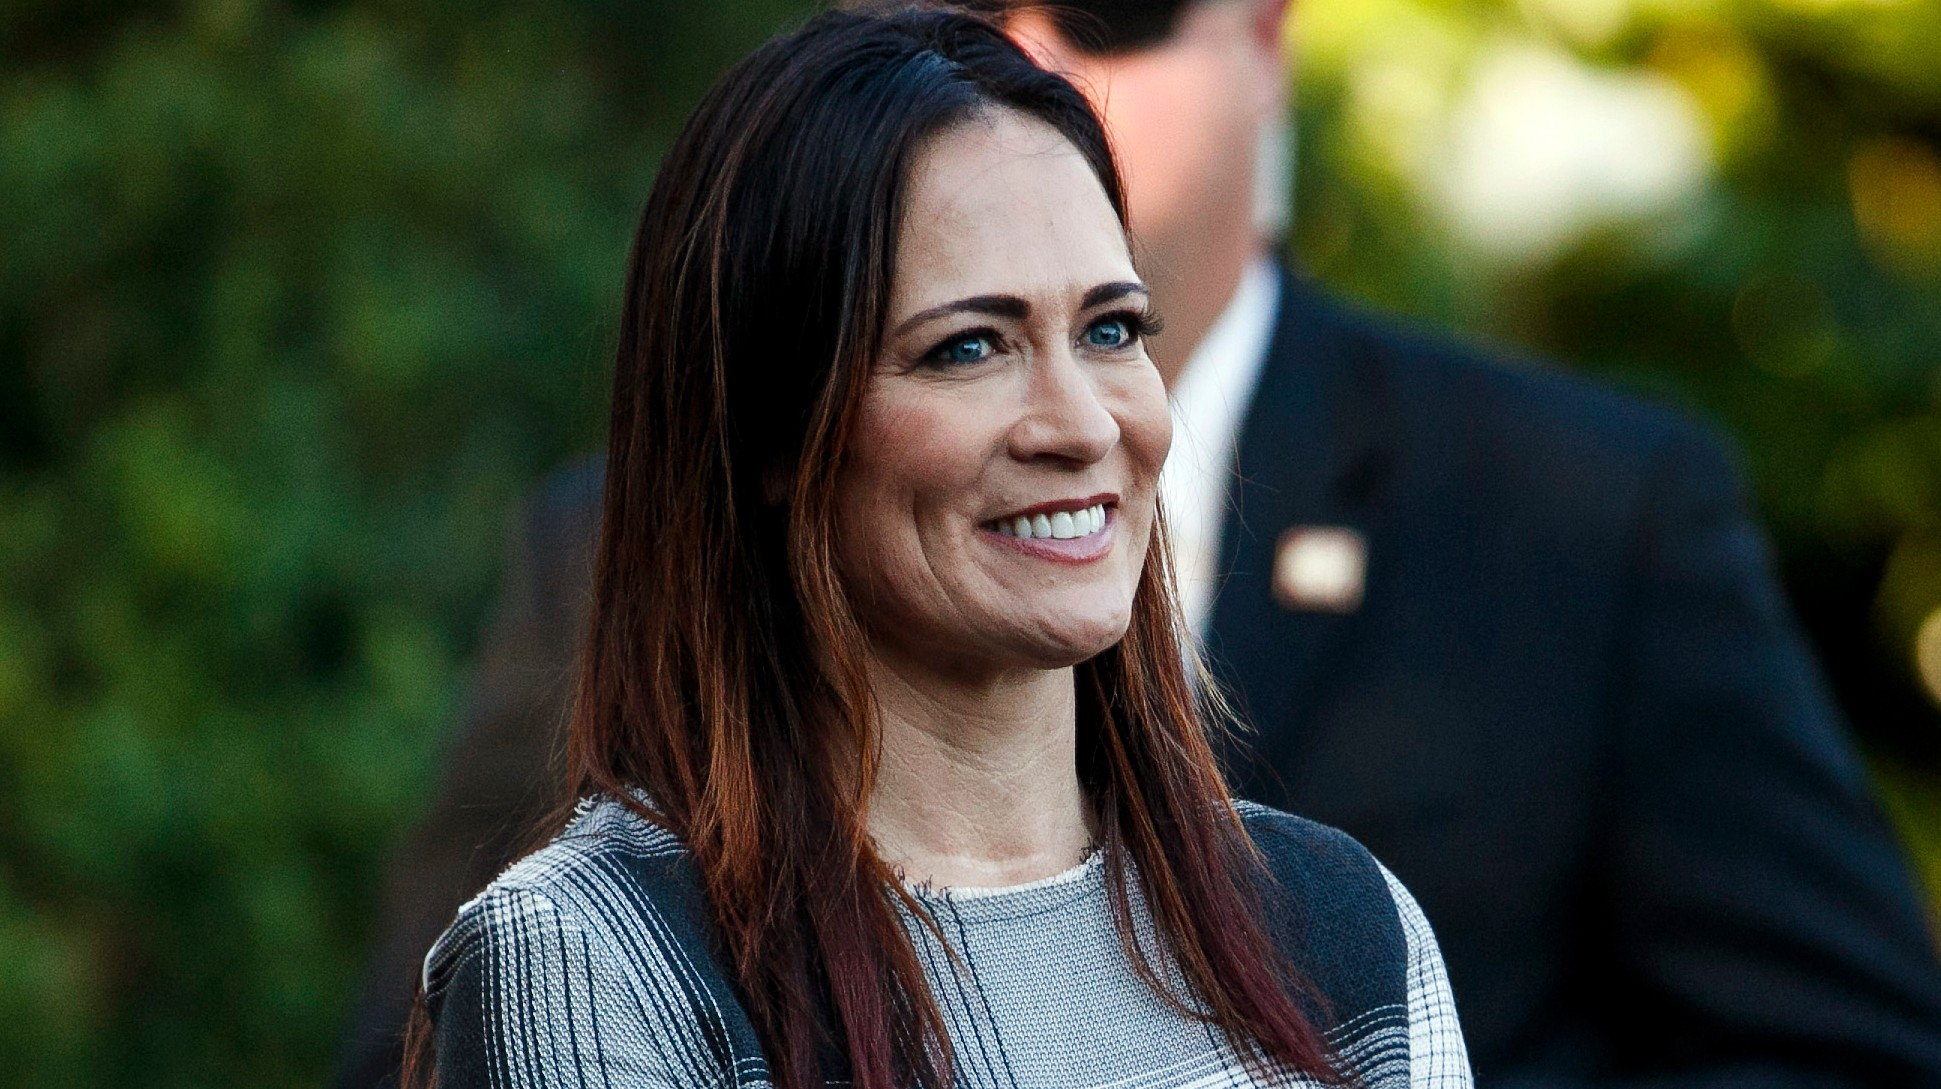 The White House Has a New Press Secretary: Stephanie Grisham